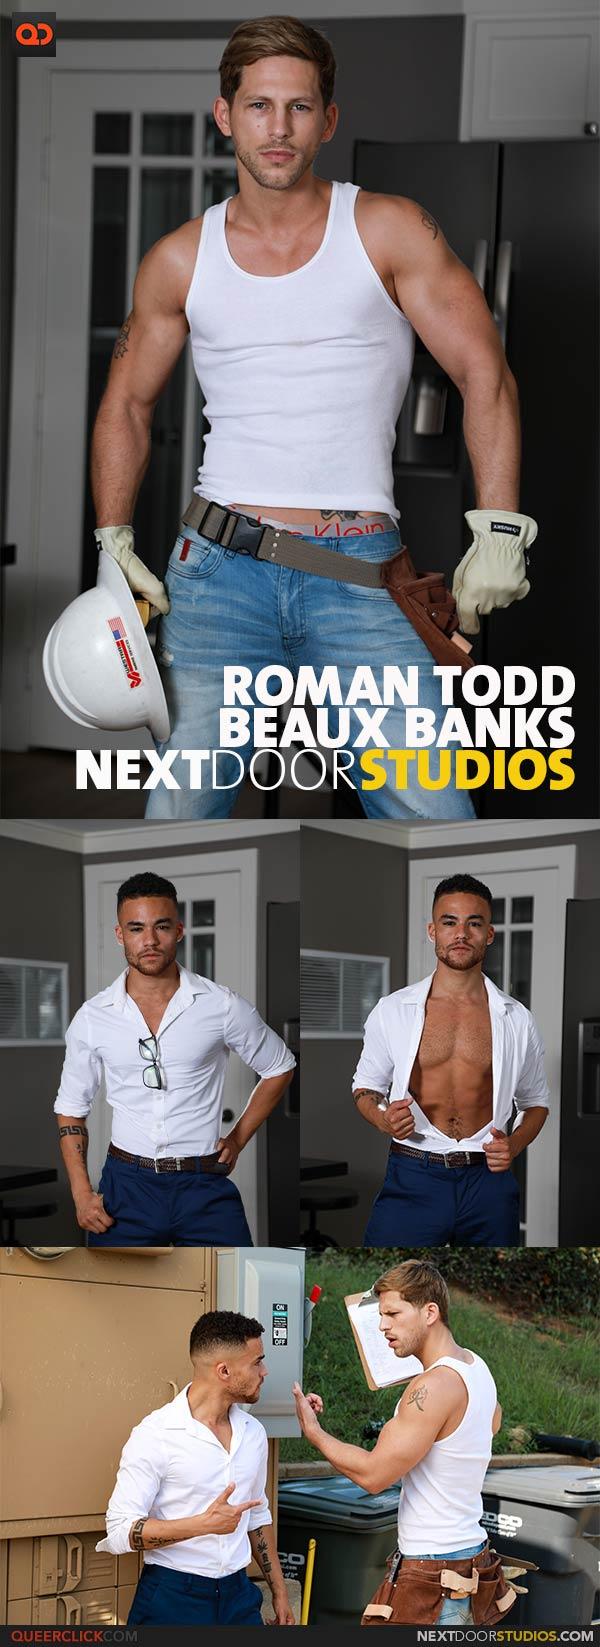 NextDoorStudios: Beaux Banks and Roman Todd